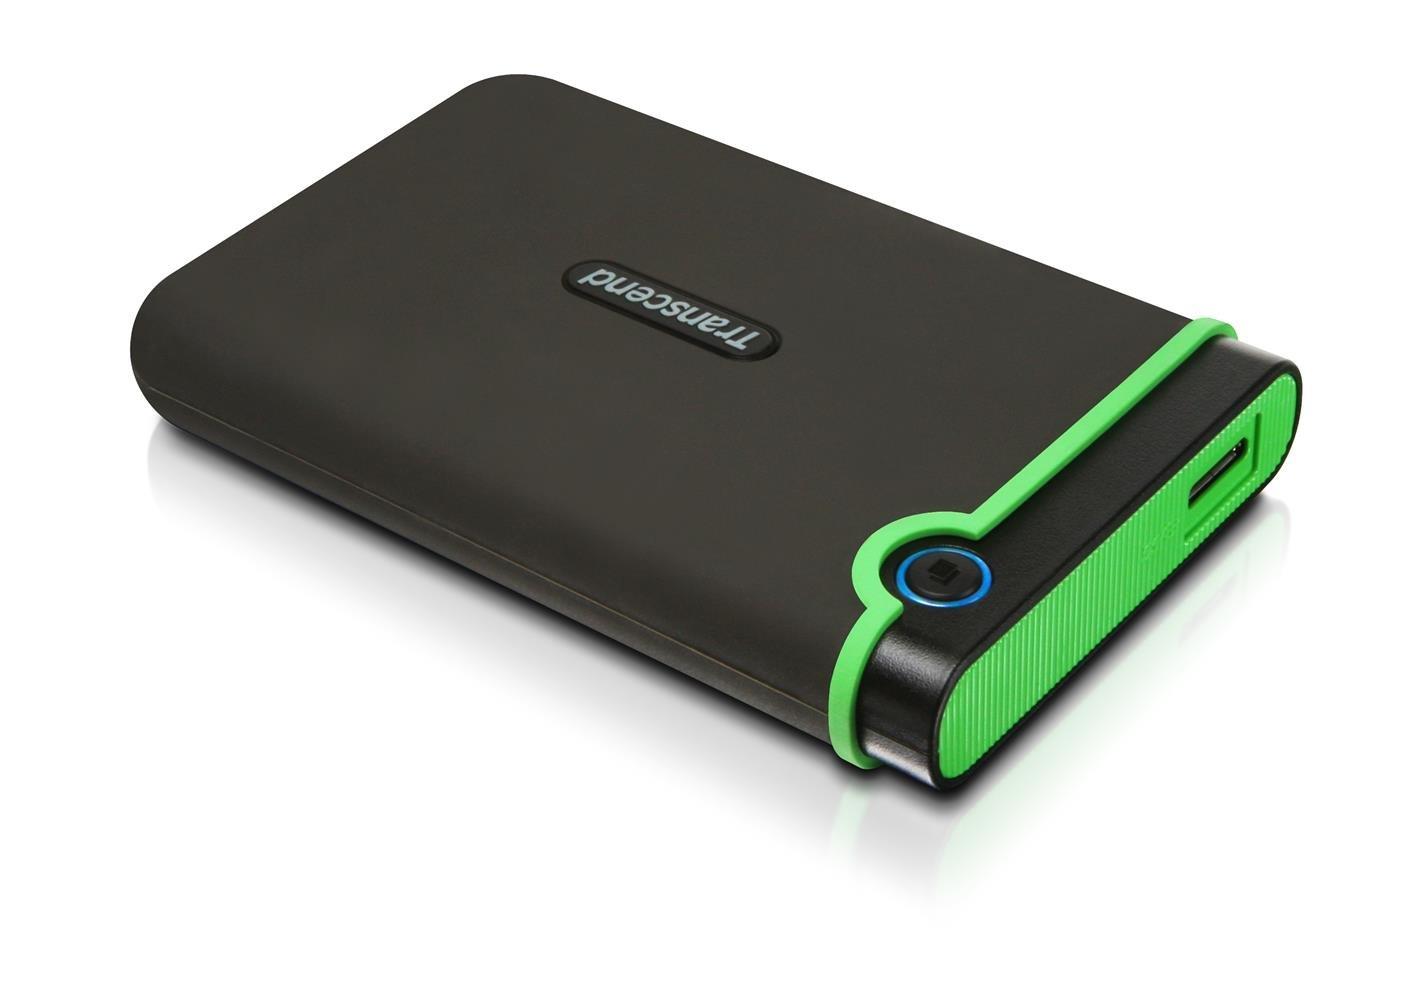 Amazon.com: Transcend 1 TB StoreJet M3 Military Drop Tested USB 3.0  External Hard Drive: Computers & Accessories